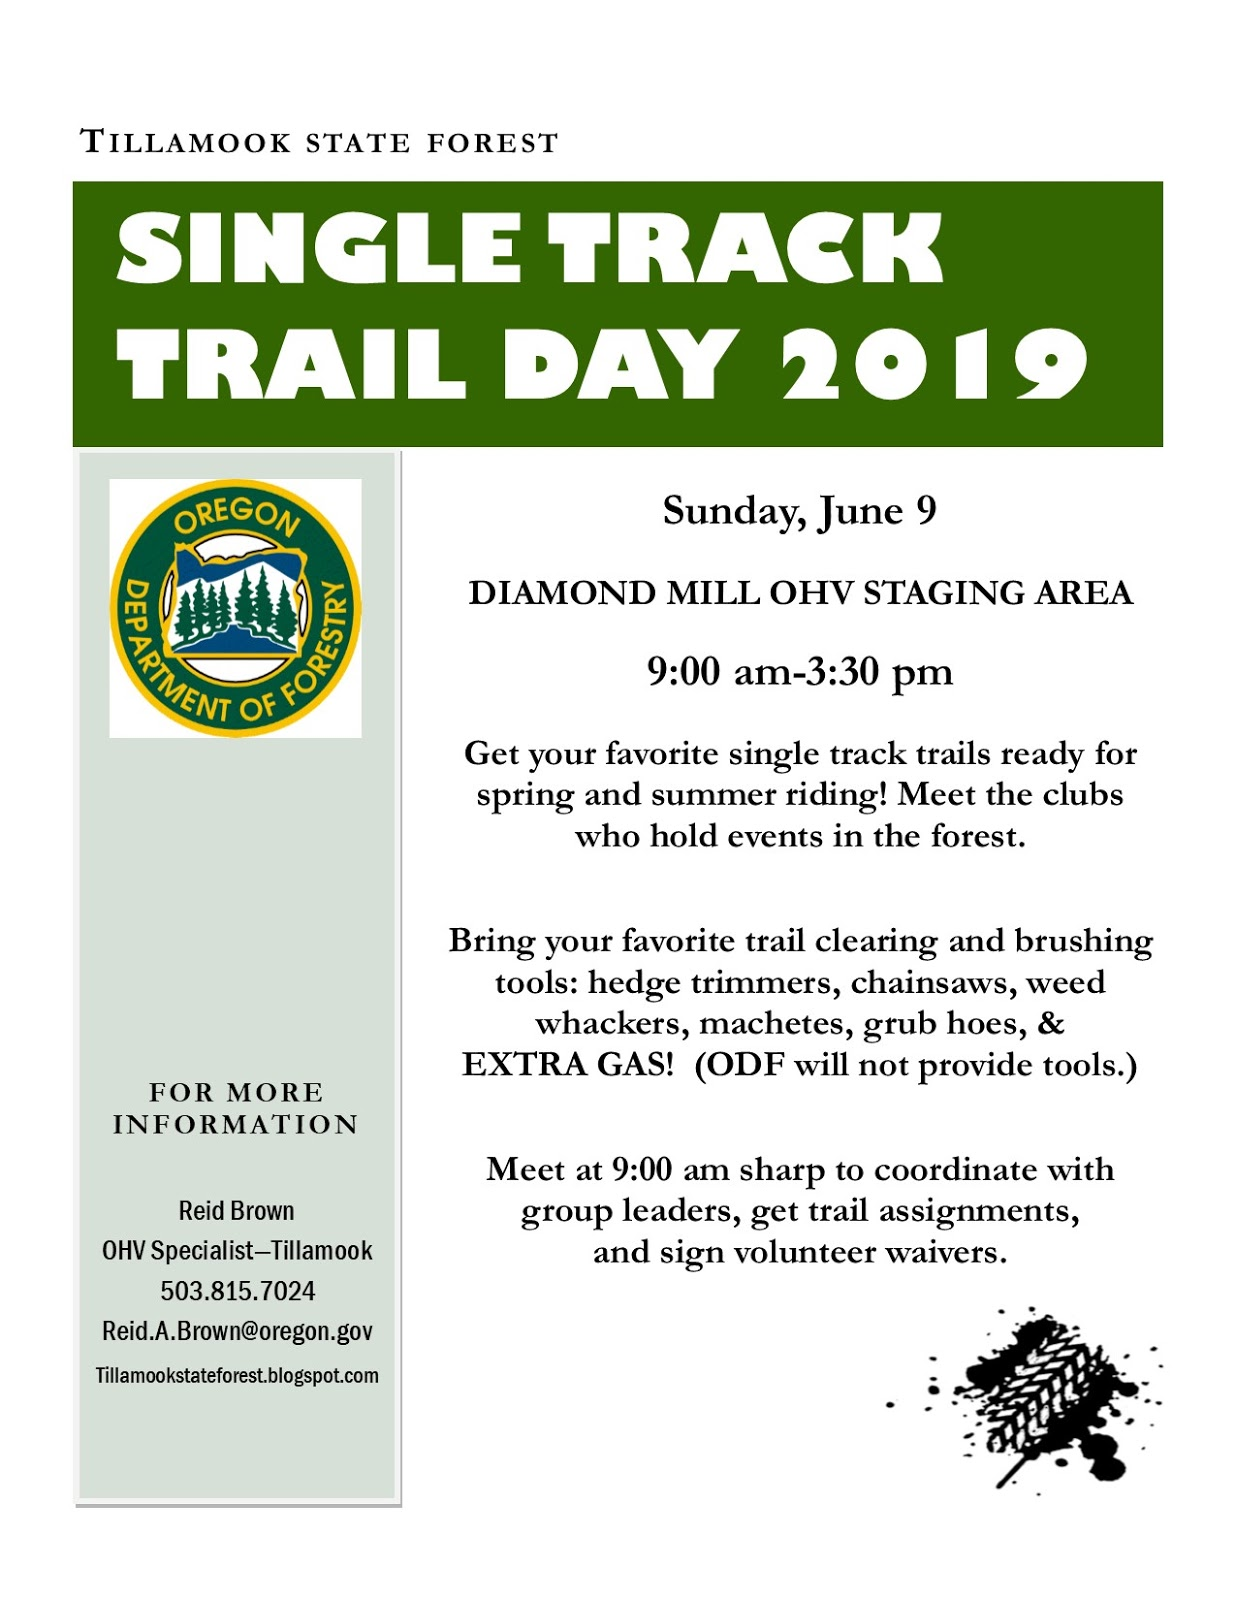 2019 Single Track Trail Day Flyer.jpg